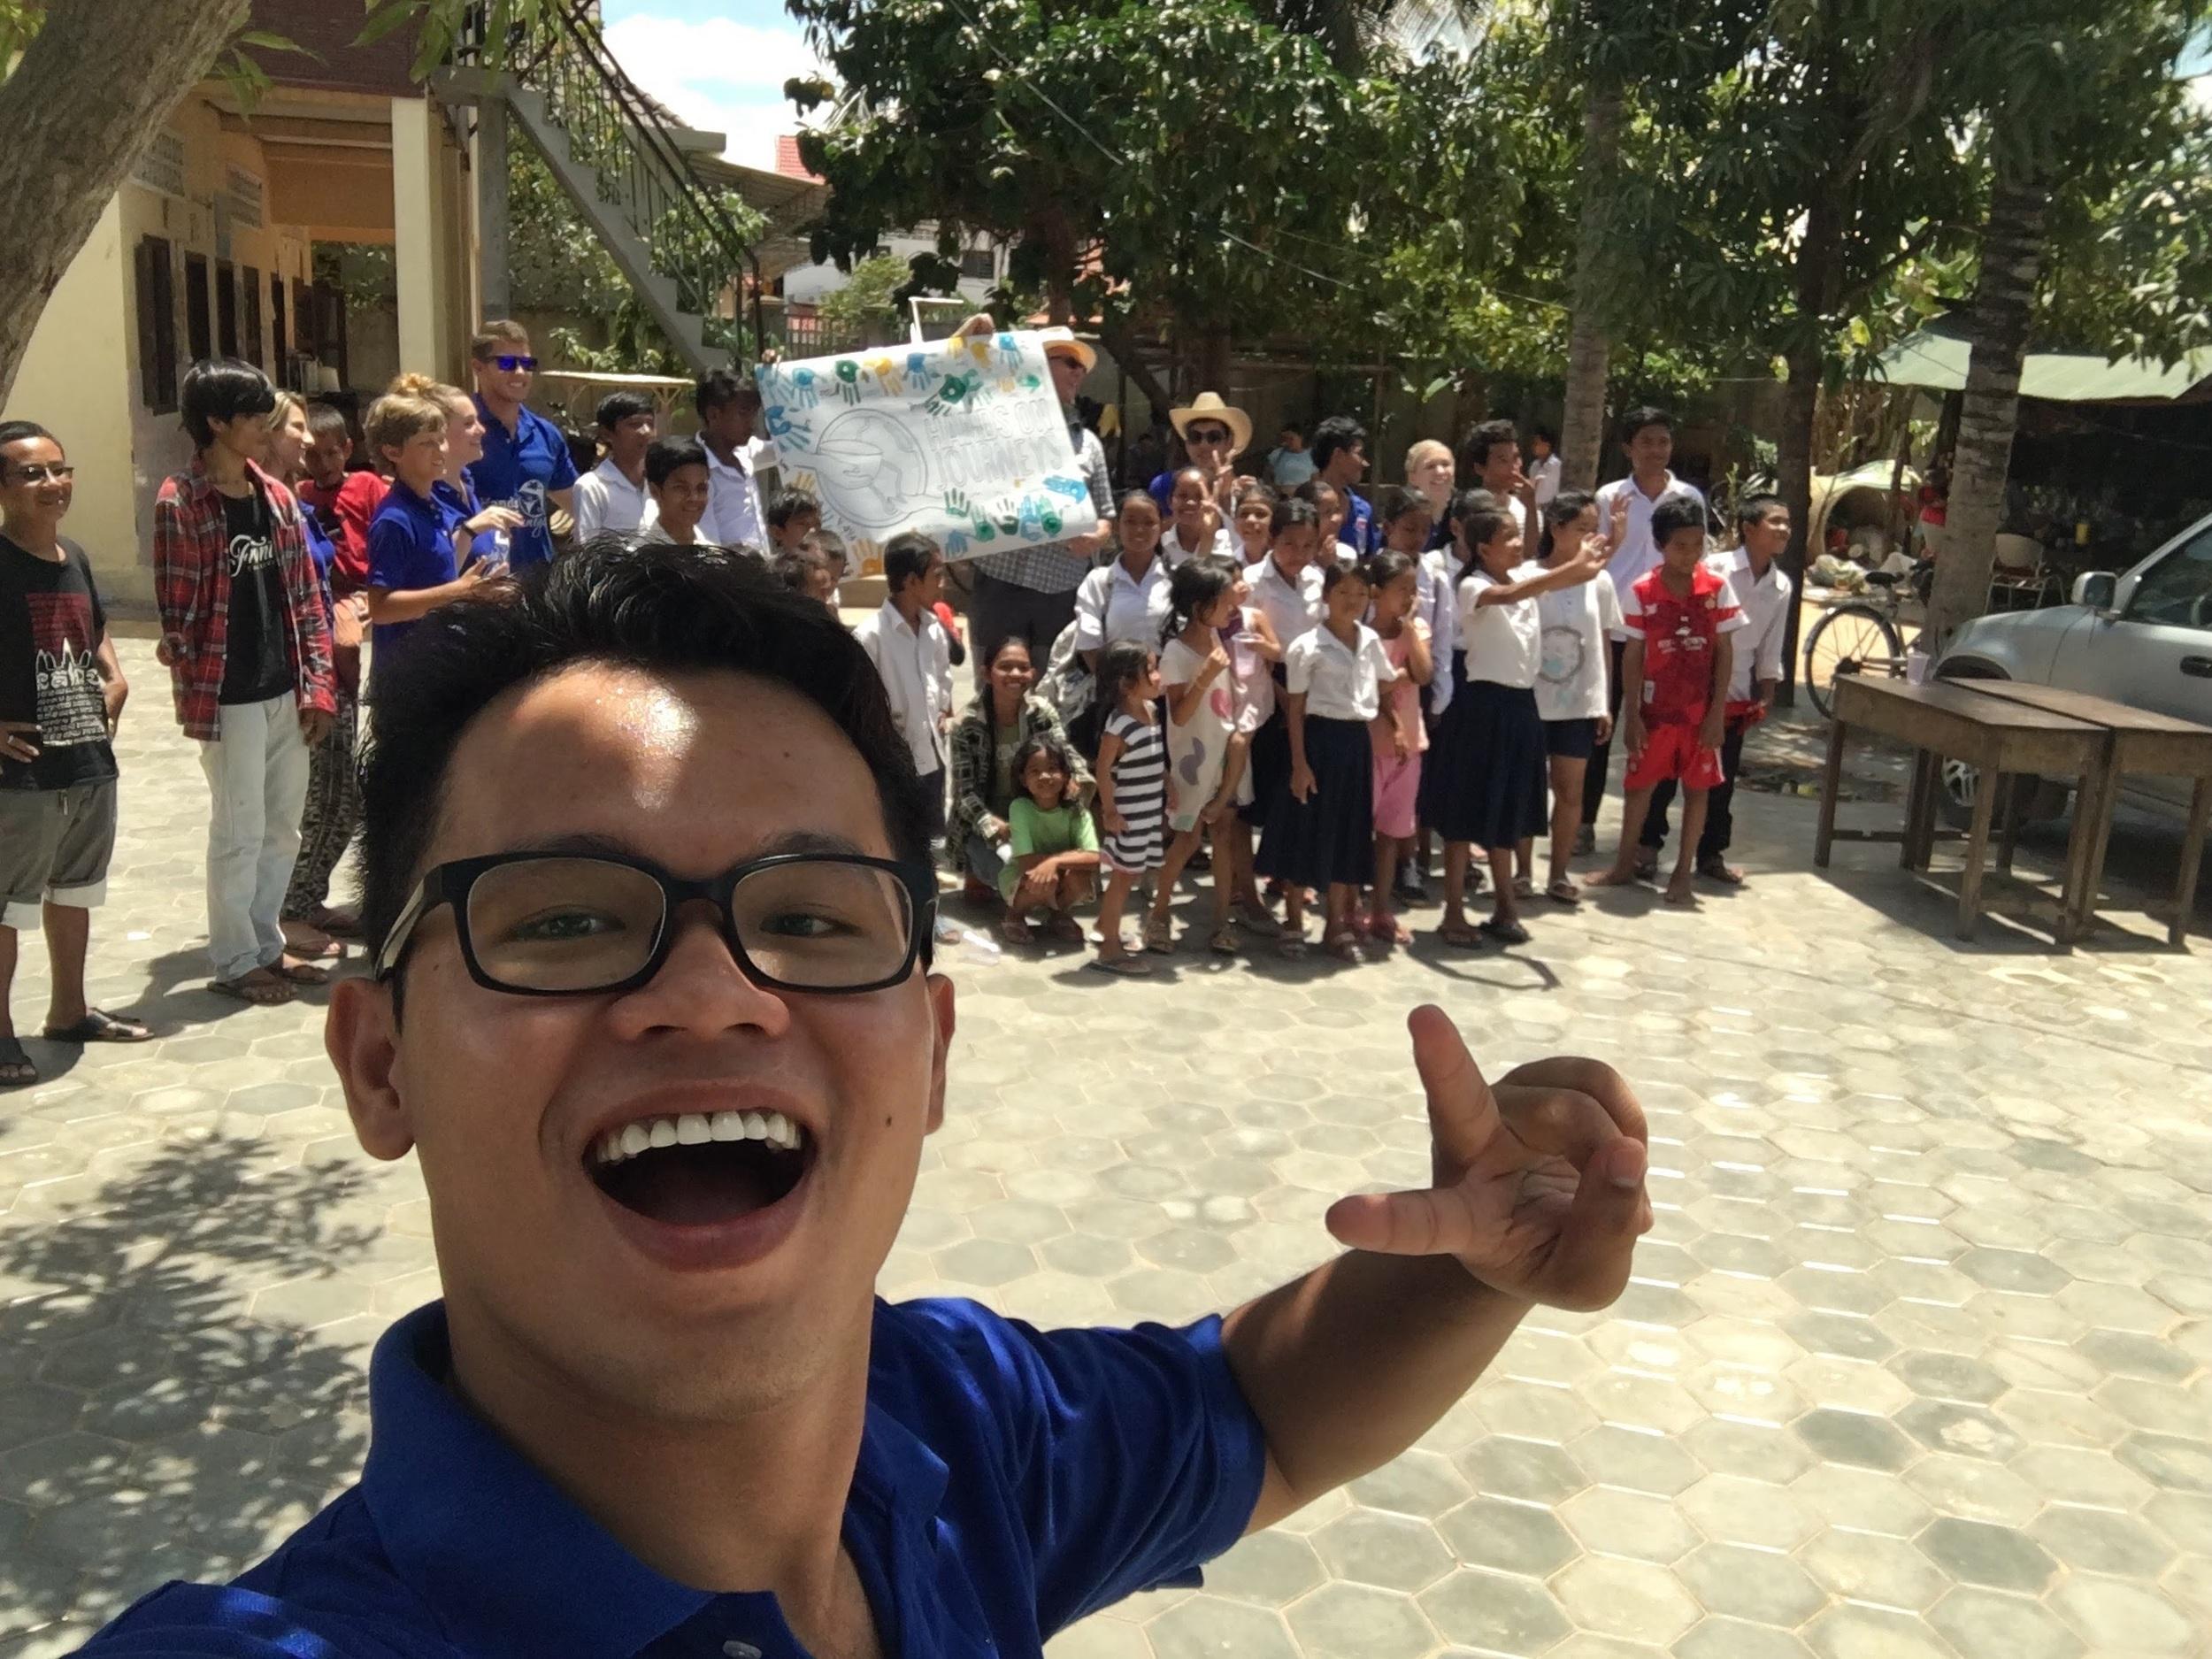 Cham Cham the Selfie Man